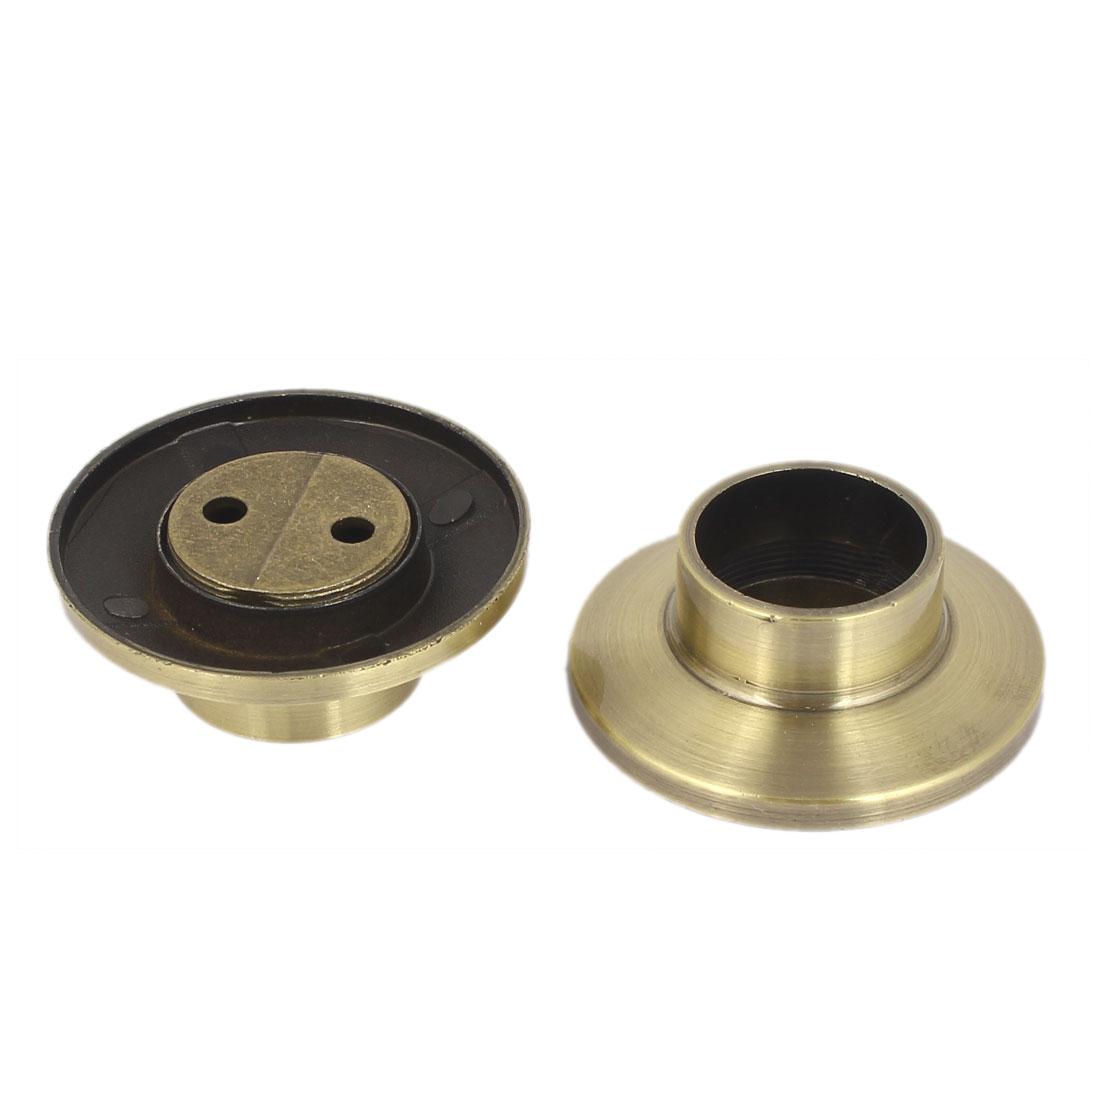 Metal Wardrobe Hanging Rail Rod End Support Bracket Socket Bronze Tone 2pcs